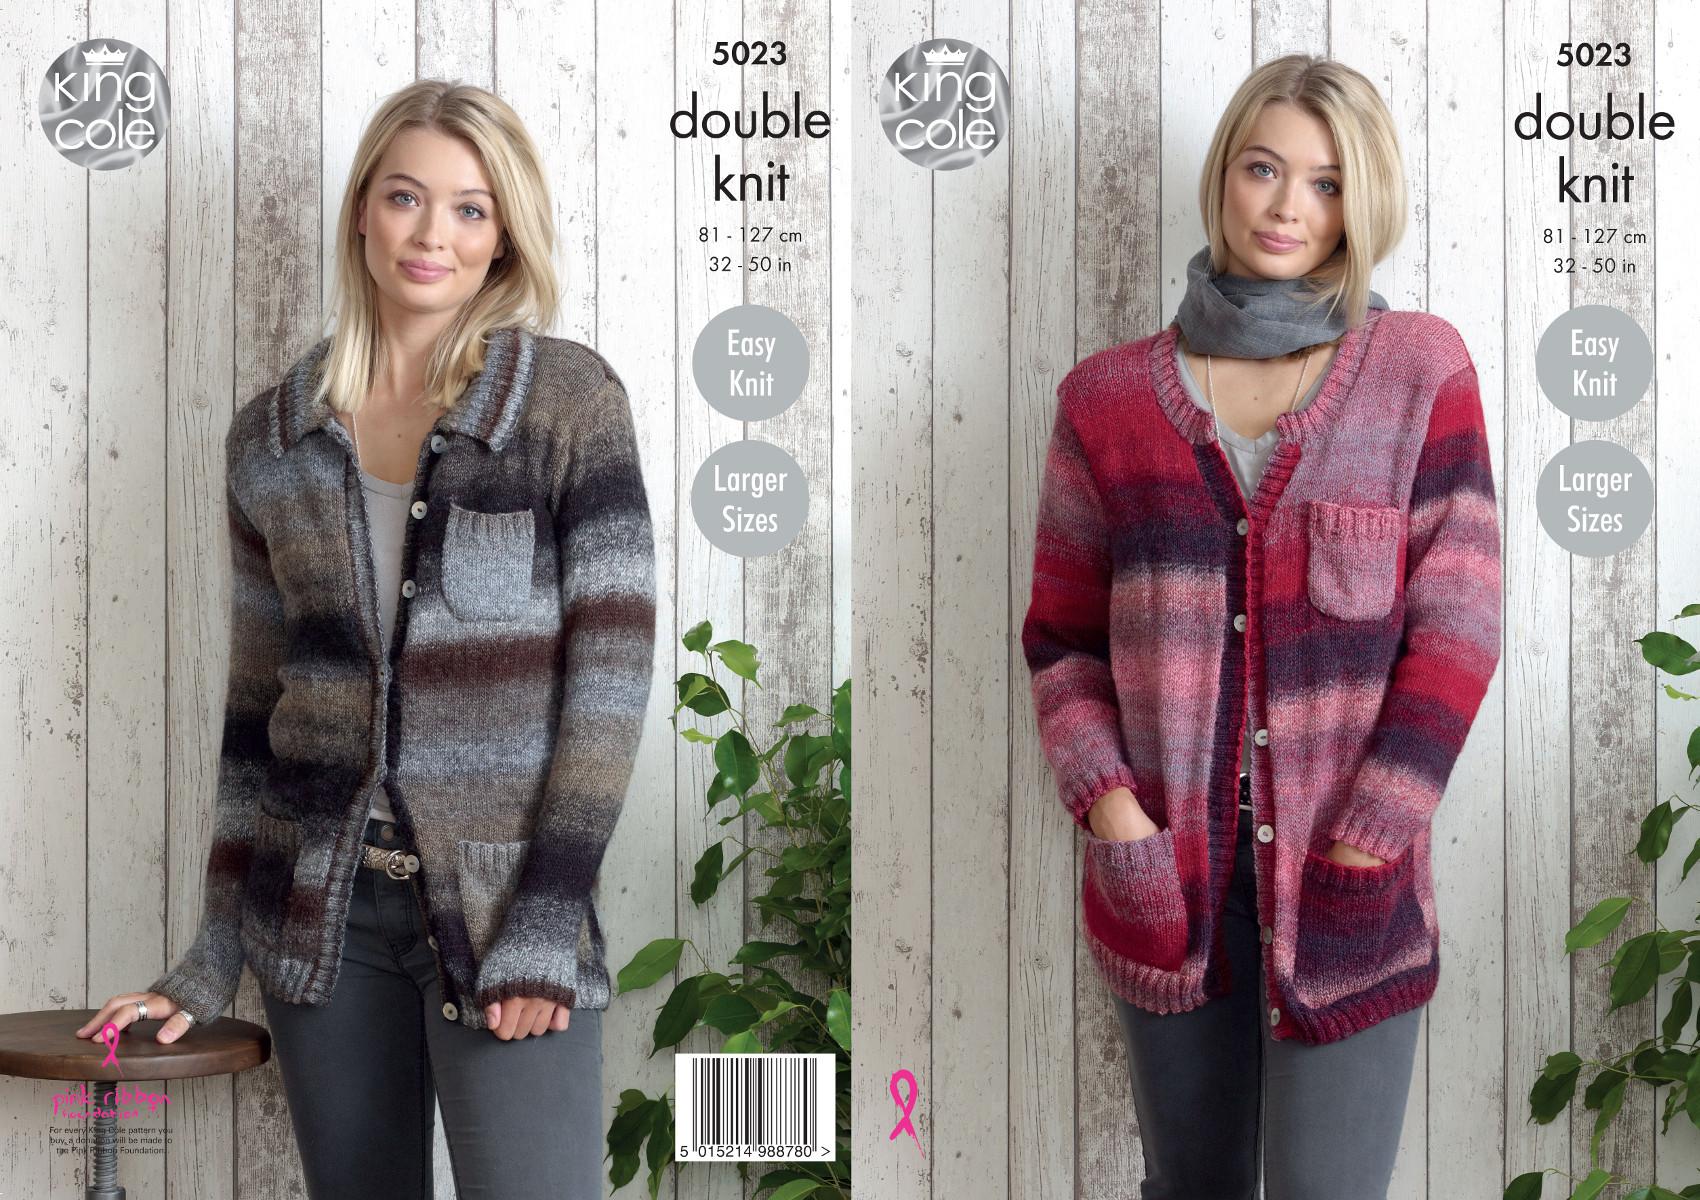 c86dfaff50de King Cole Ladies Knitting Pattern Easy Knit Split Neck or Collar ...